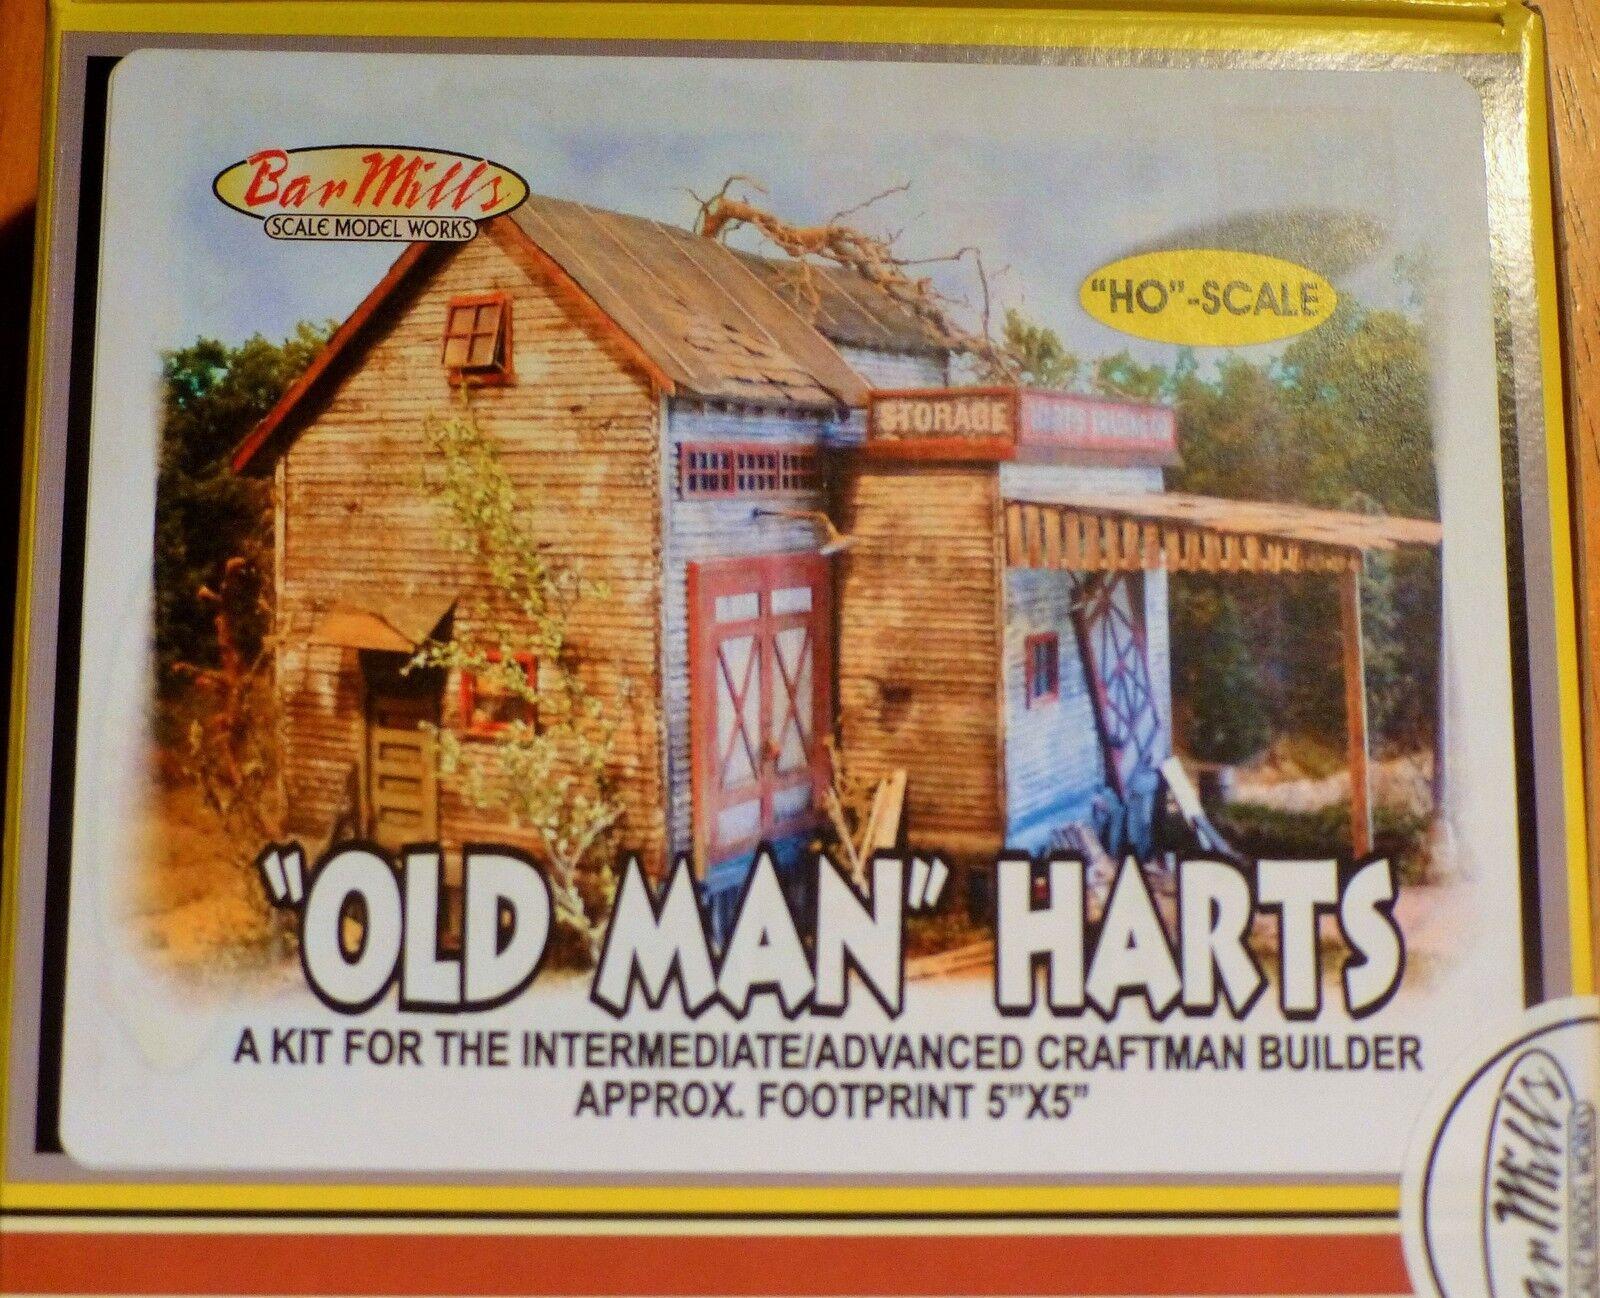 Bar Mills (HO Scale) Viejo Hart's -- Kit - 7-1 2 X 8-1 2  19.1 X 21.6 Cm